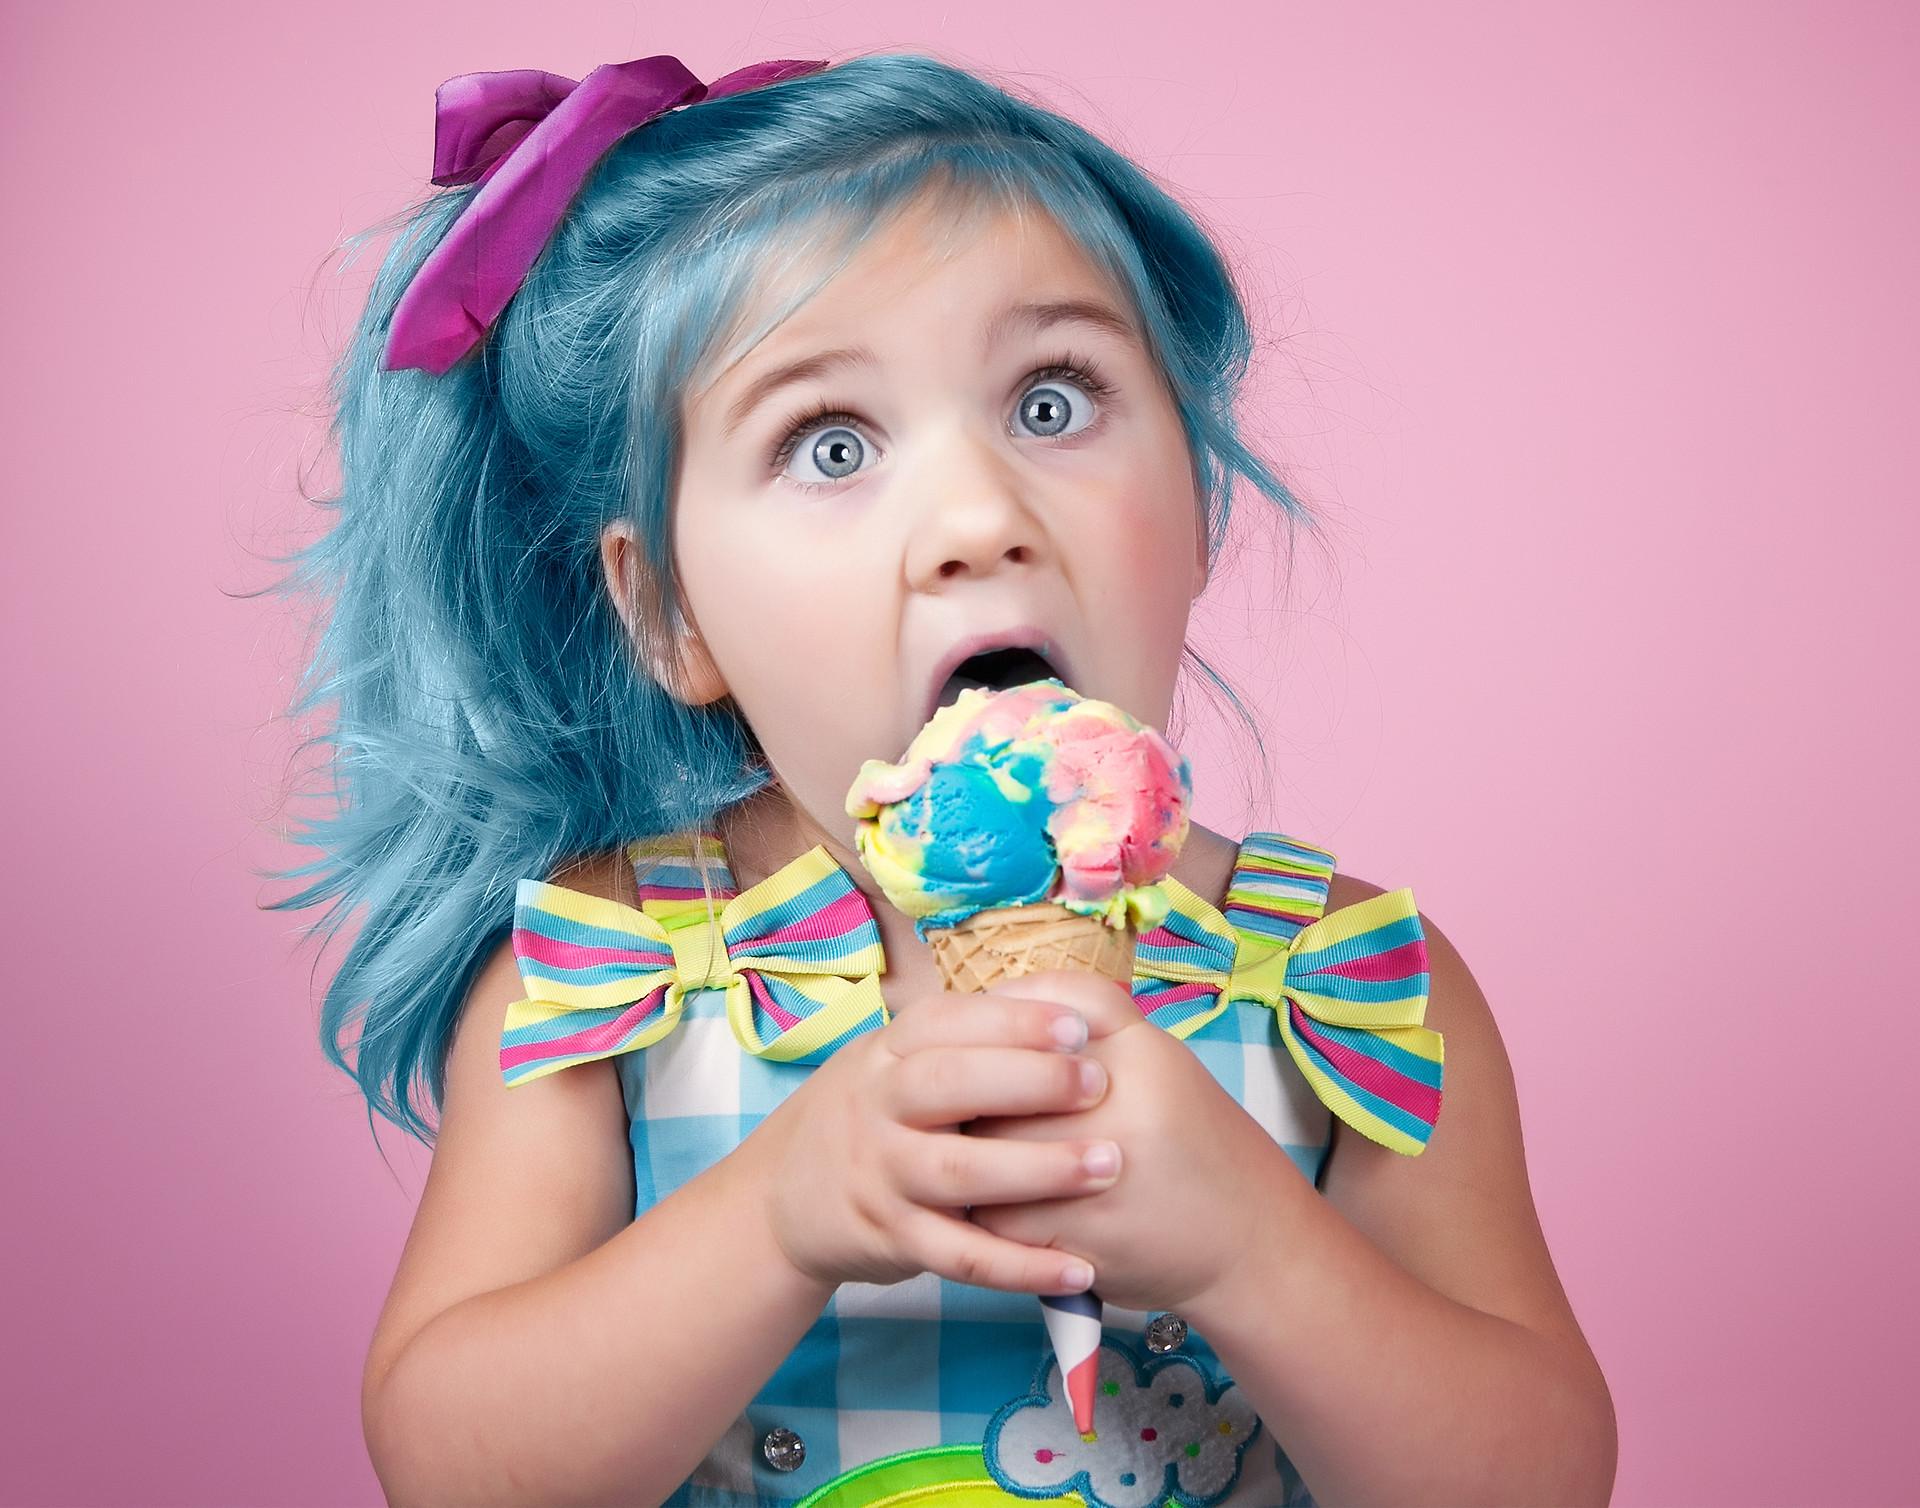 sugar photoshoot